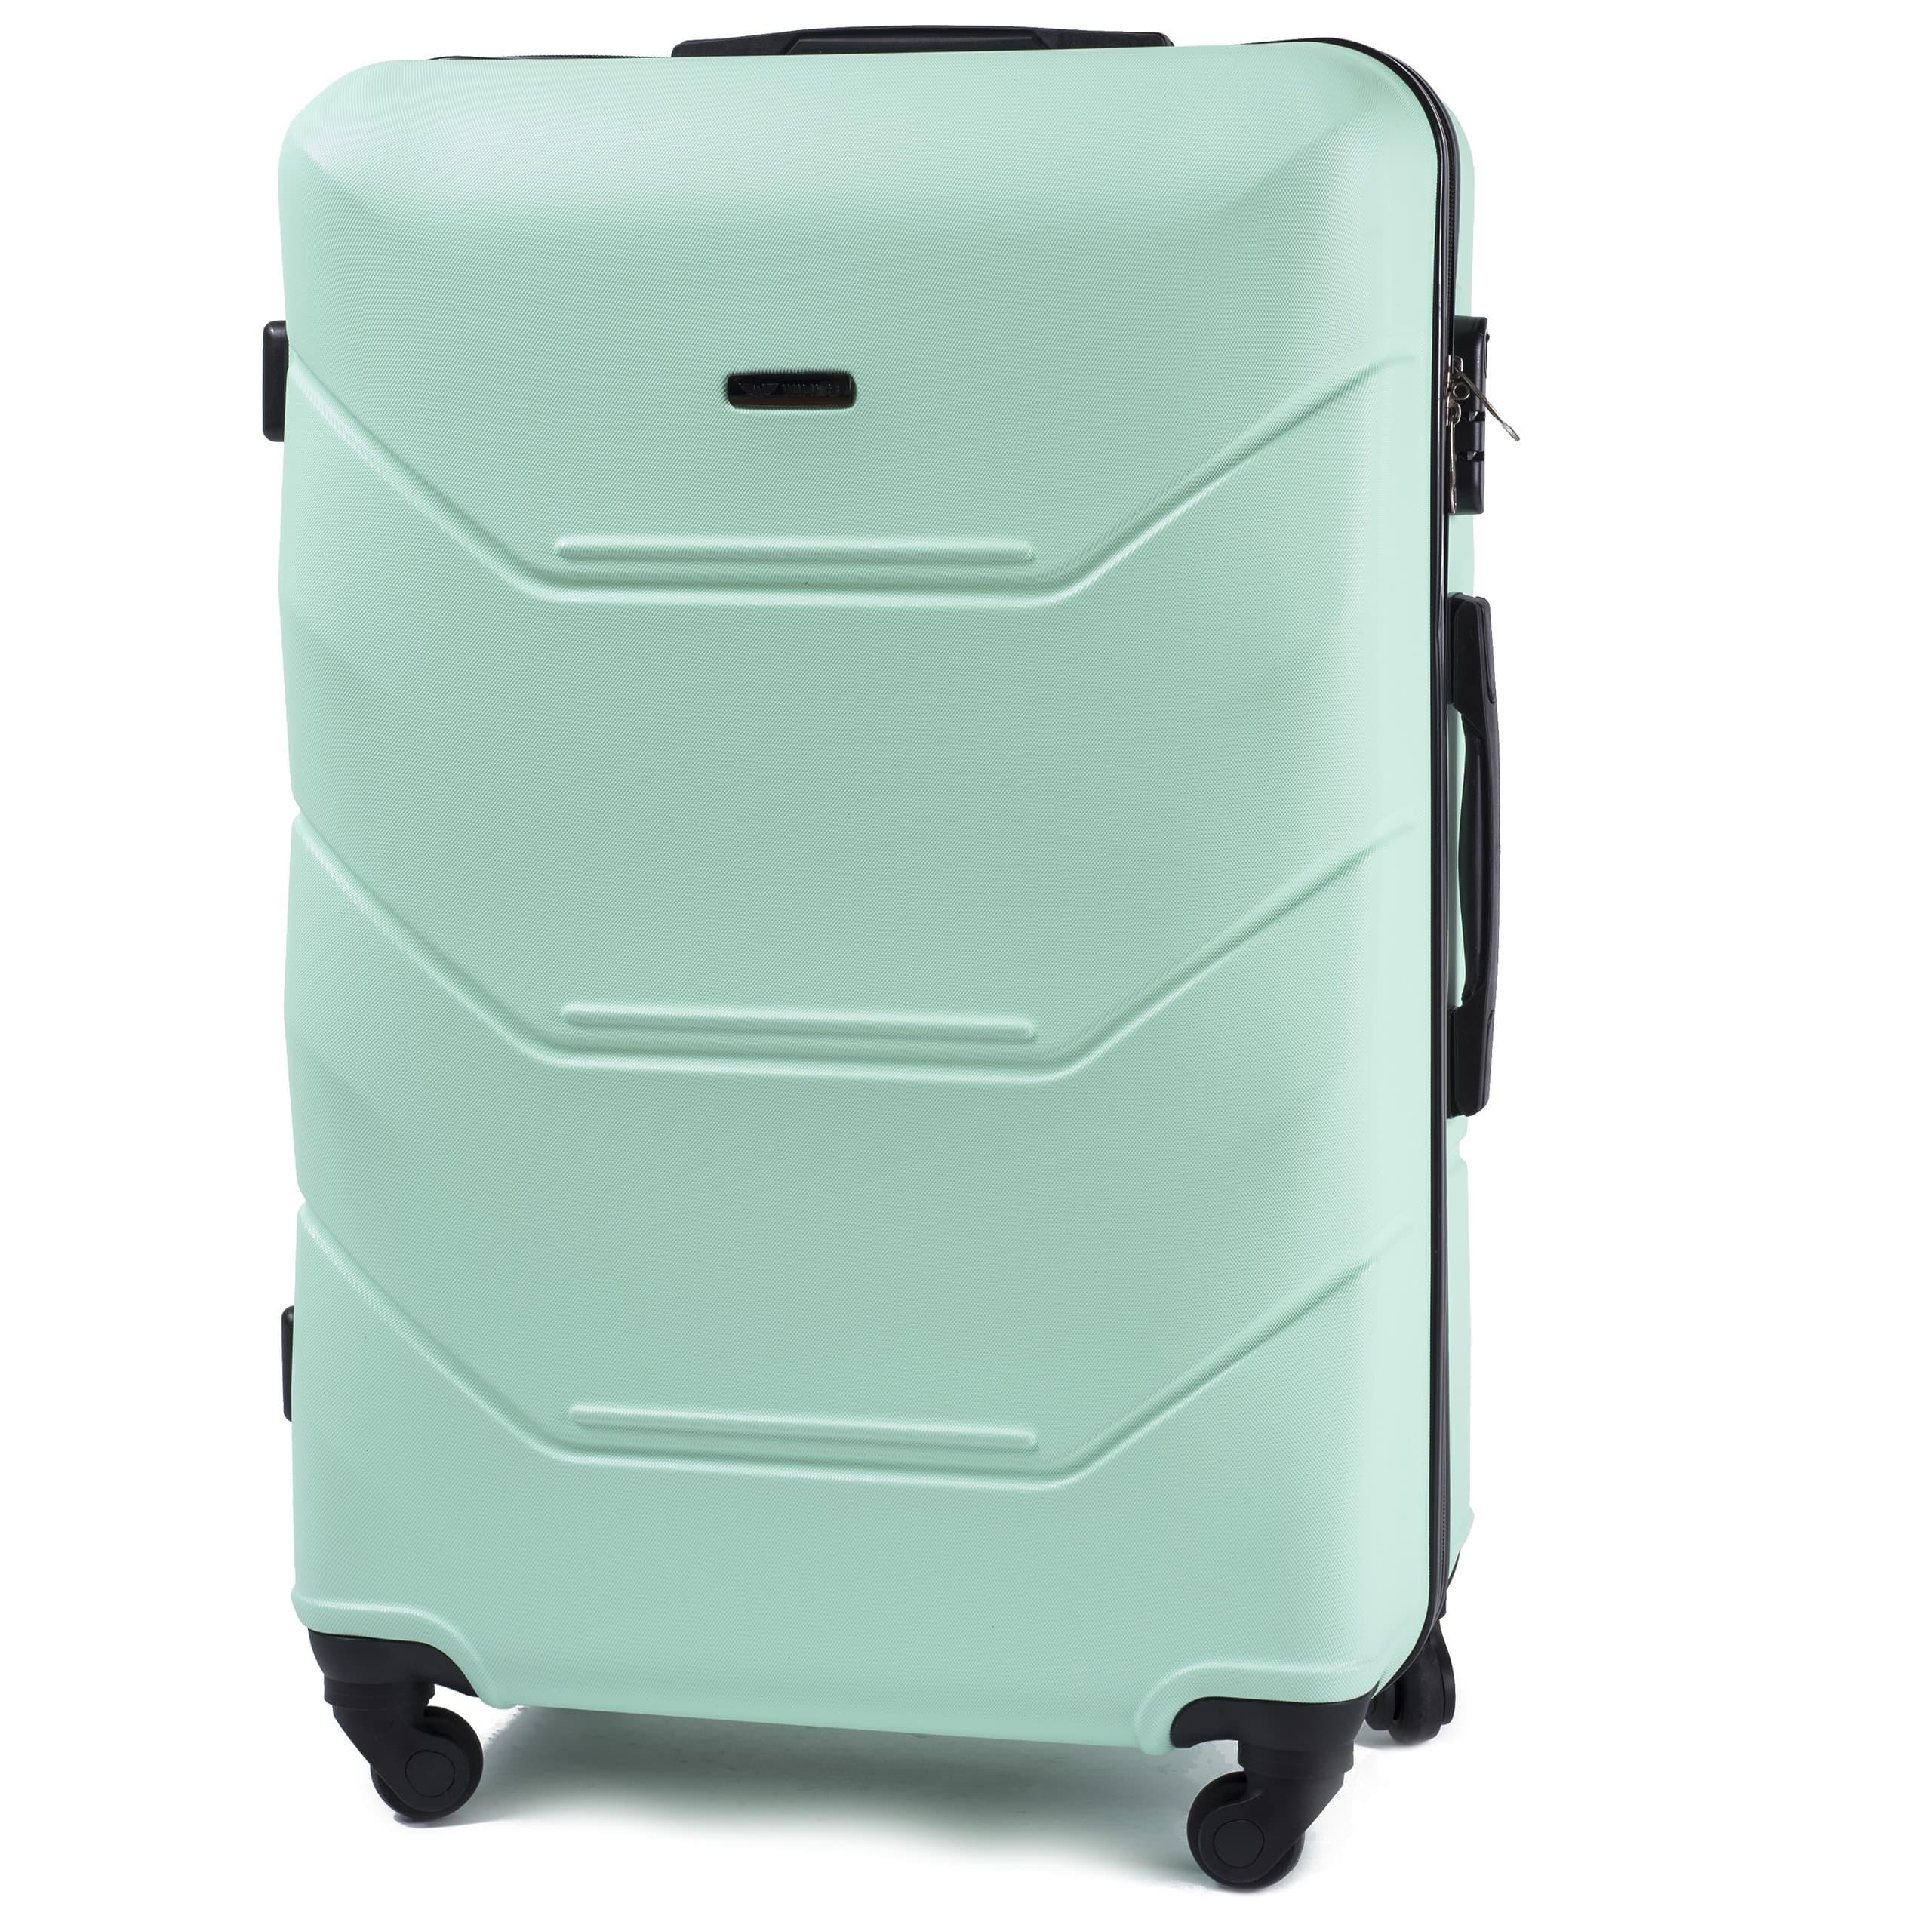 БОЛЬШОЙ ЧЕМОДАН WINGS 147 L Light Green PREMIUM НА 4-Х КАУЧУКОВЫХ КОЛЕСАХ! Для багажа ,до 23 кг